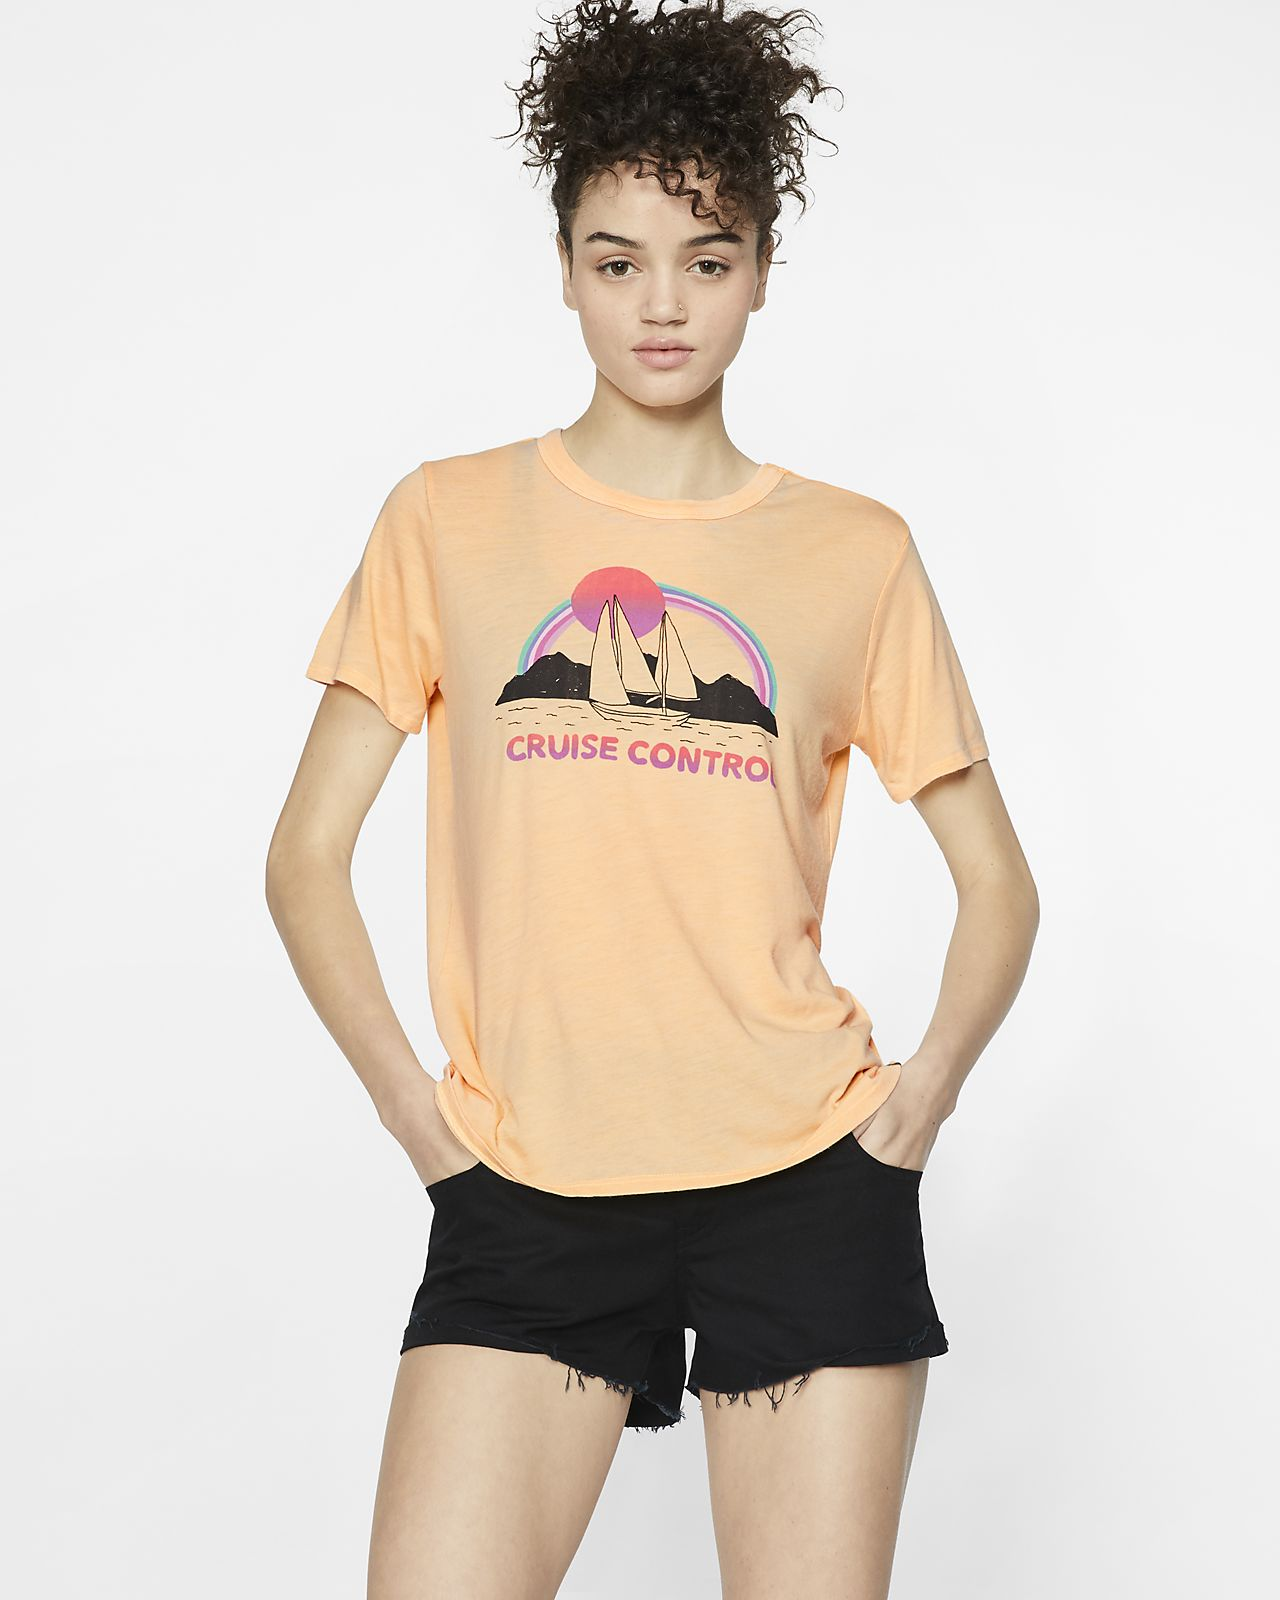 Hurley Cruise Control Camiseta - Mujer